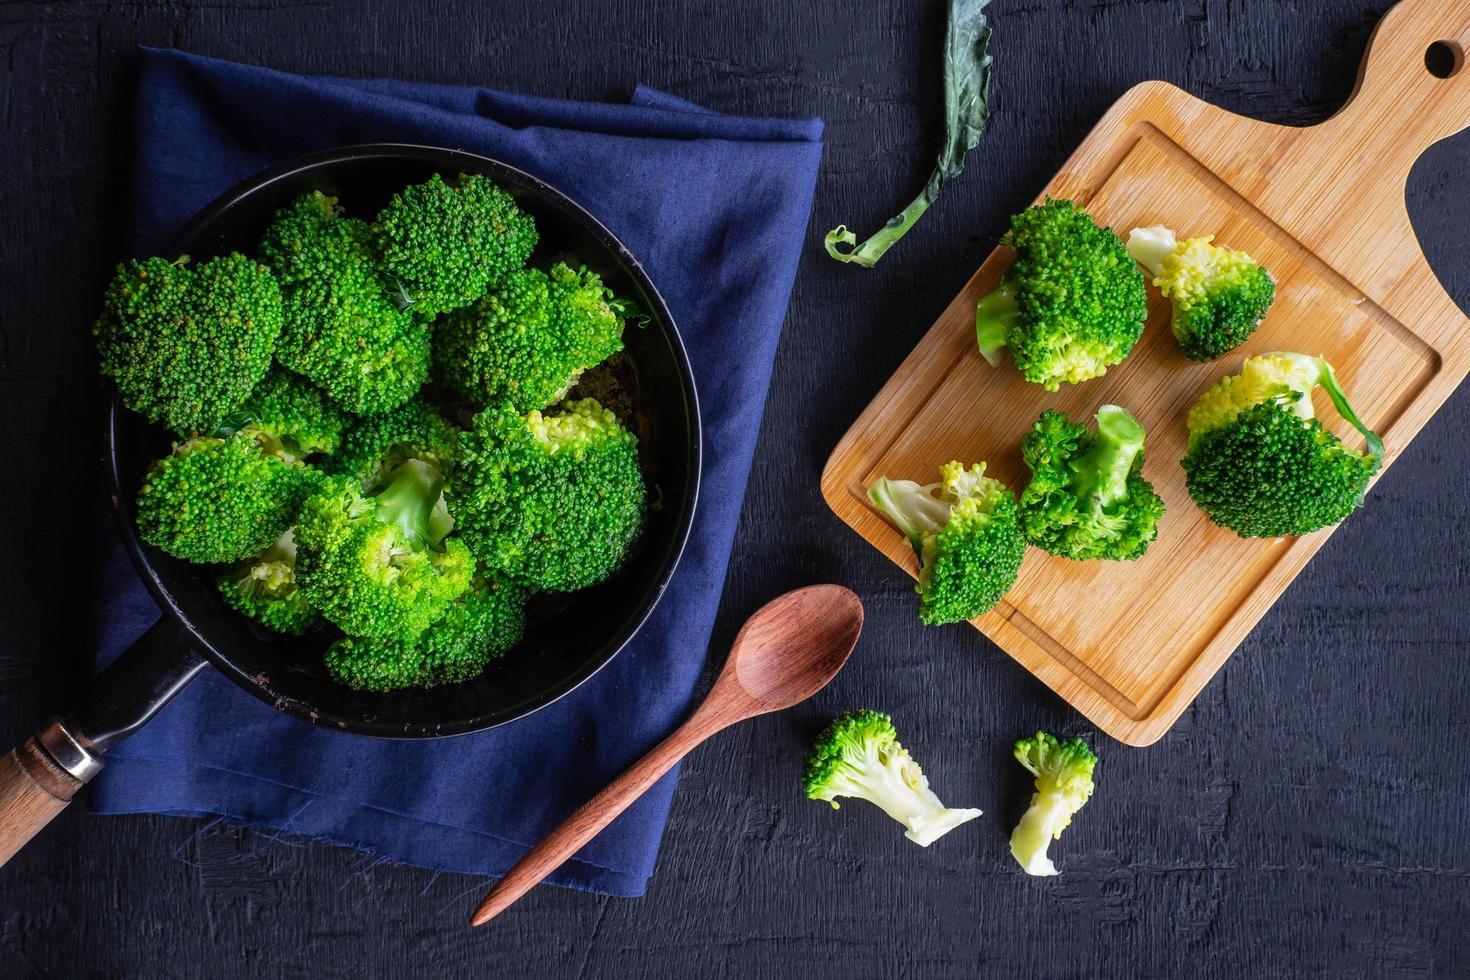 cocinar brócoli fresco verduras comida sana foto